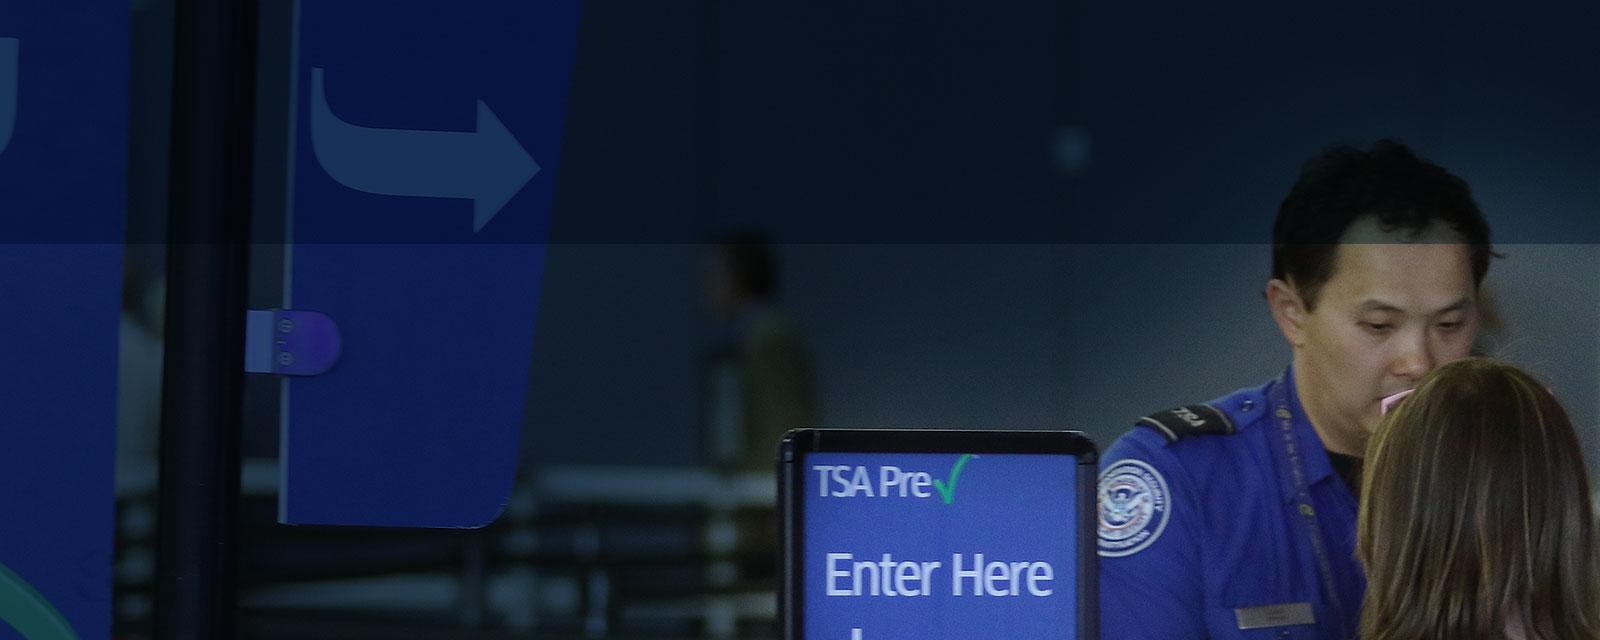 'McCarran International Airport' from the web at 'https://www.mccarran.com/FSWeb/assets/LAS/images/images_jssor/LAS_home_TSA_PreCheck_hours_1600x640.jpg'